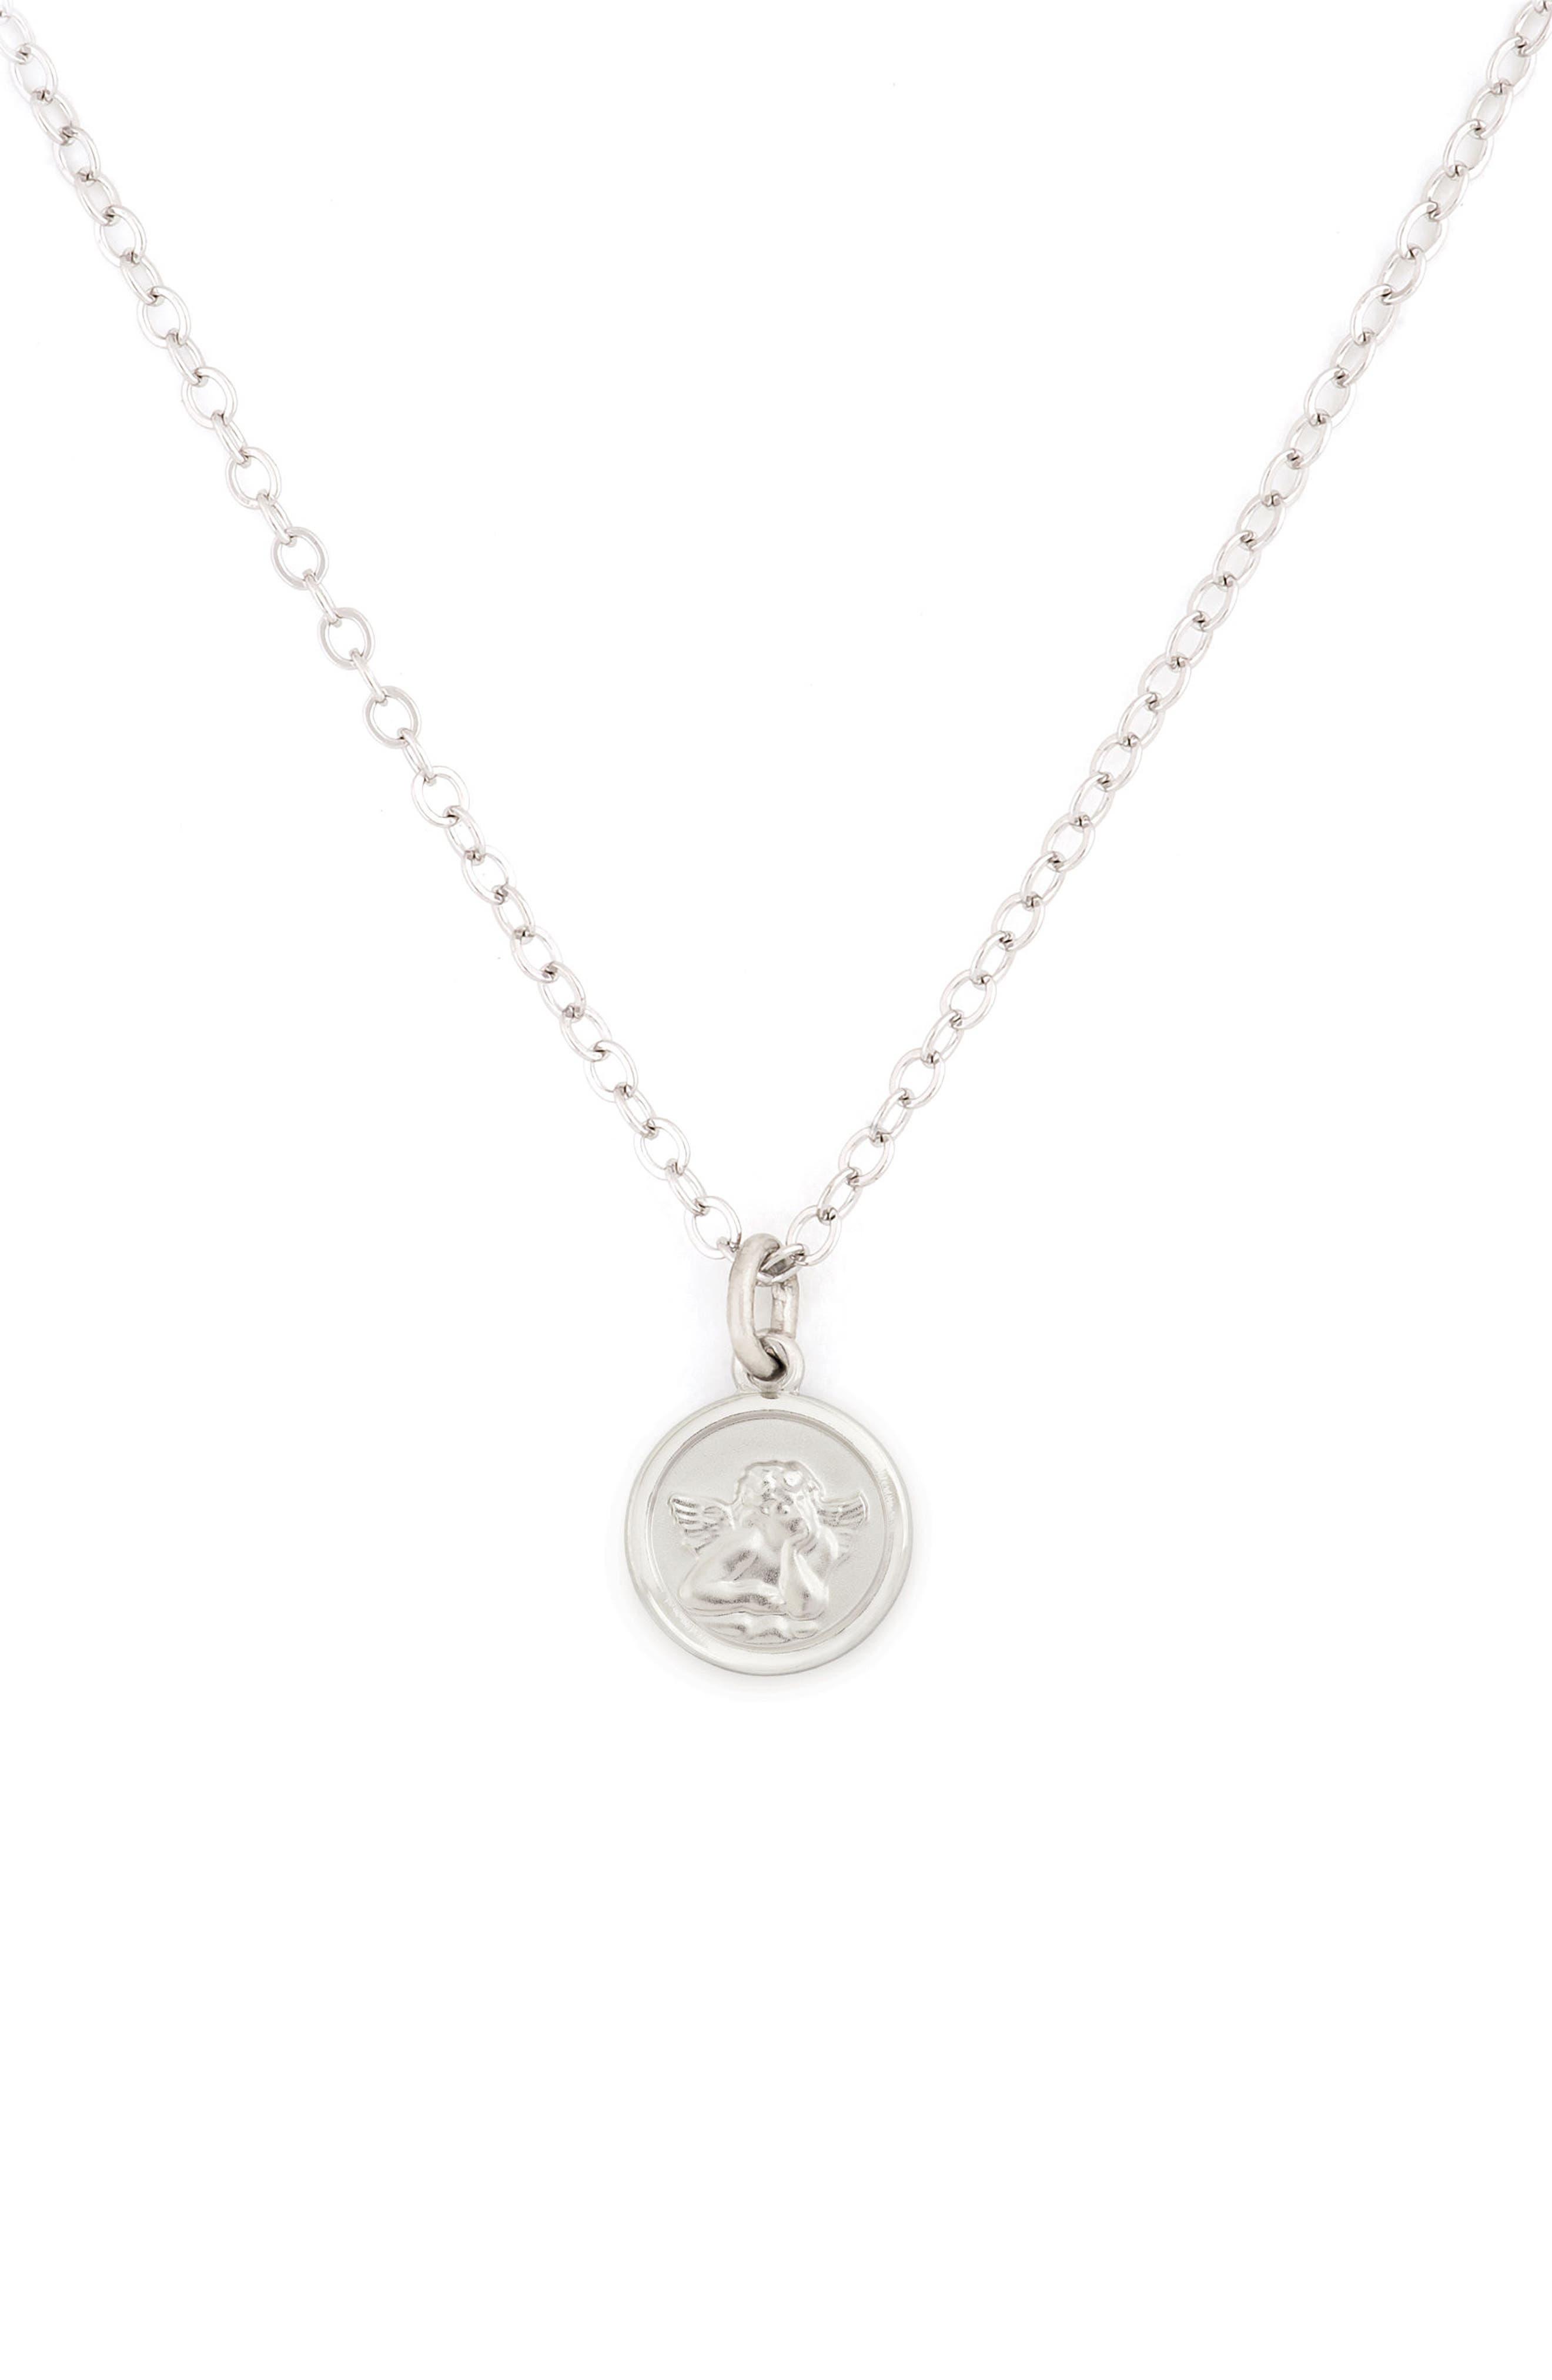 Cherub Medal Sterling Silver Pendant Necklace,                             Main thumbnail 1, color,                             040